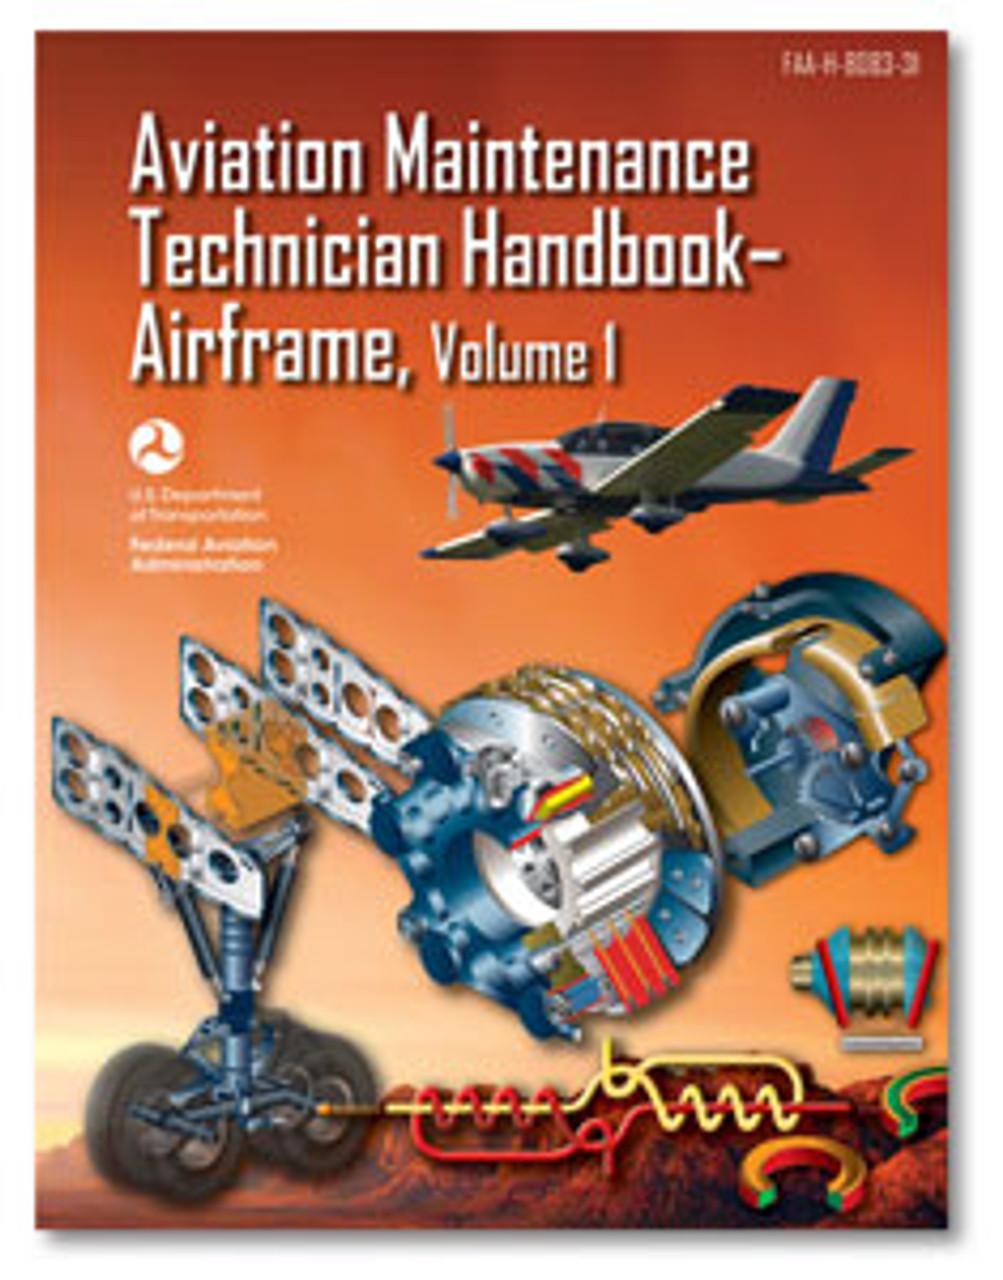 ASA: Aviation Maintenance Technician Handbook: Airframe Volume 1